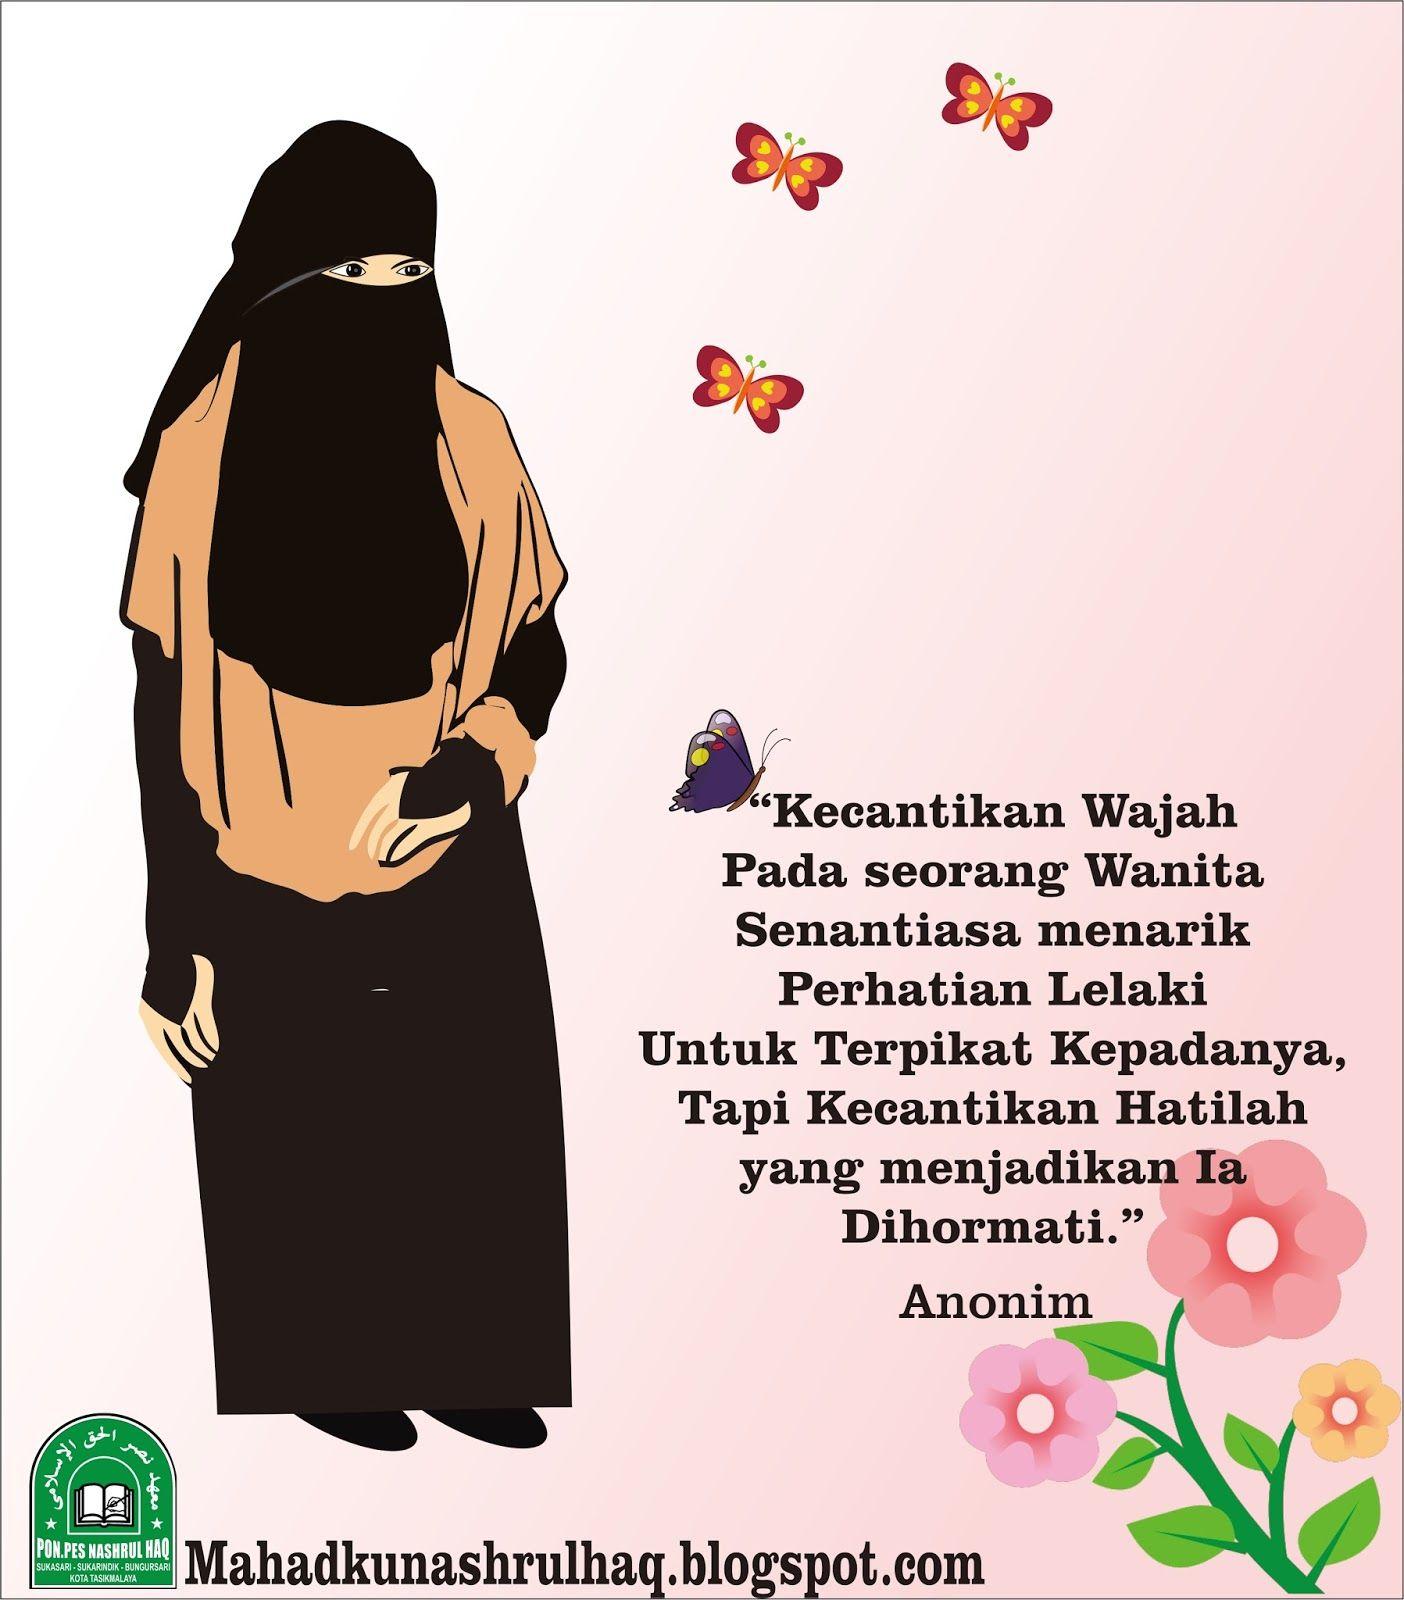 24 Gambar Wanita Muslimah Versi Kartun Gambar Ipin Di 2020 Kartun Gambar Kartun Gambar